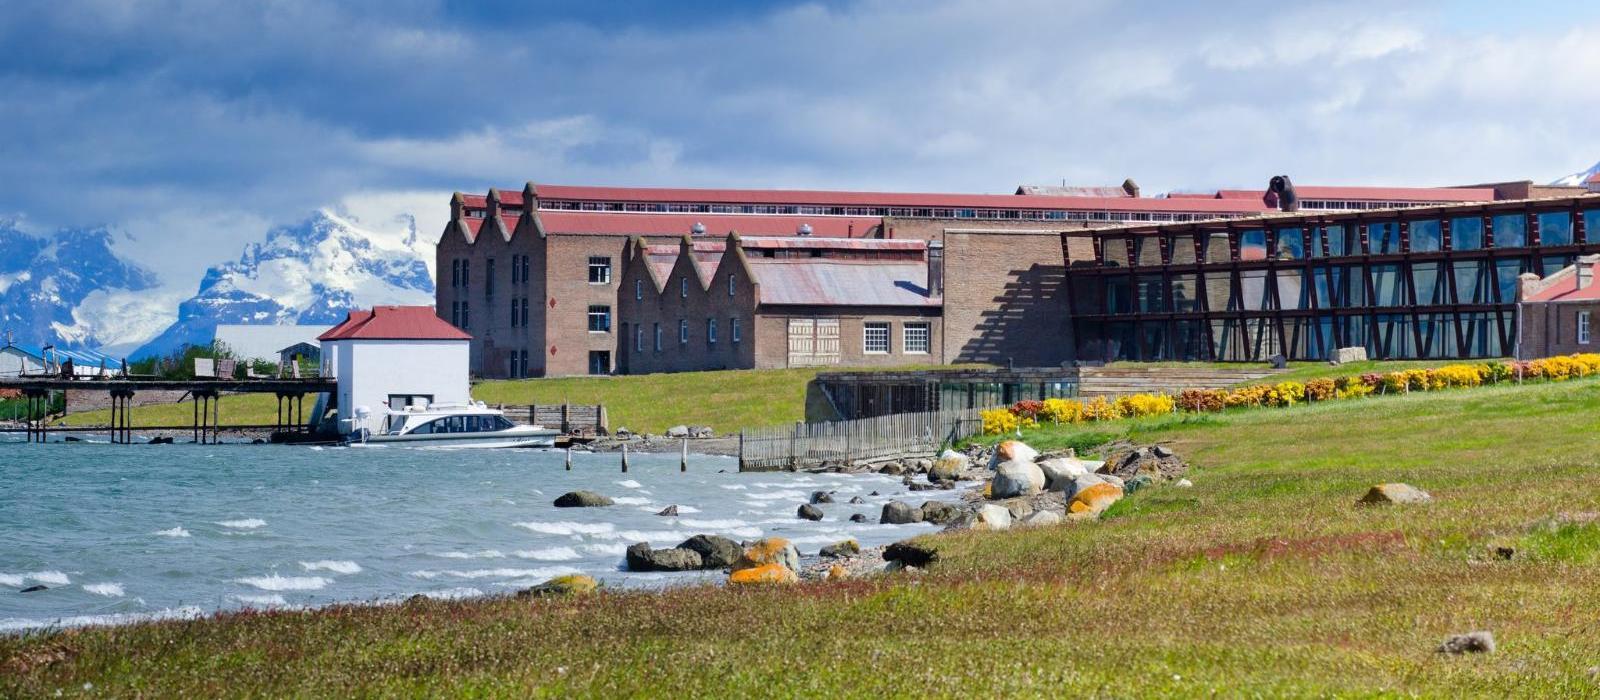 辛格勒巴塔哥尼亚酒店(The Singular Patagonia) 图片  www.lhw.cn